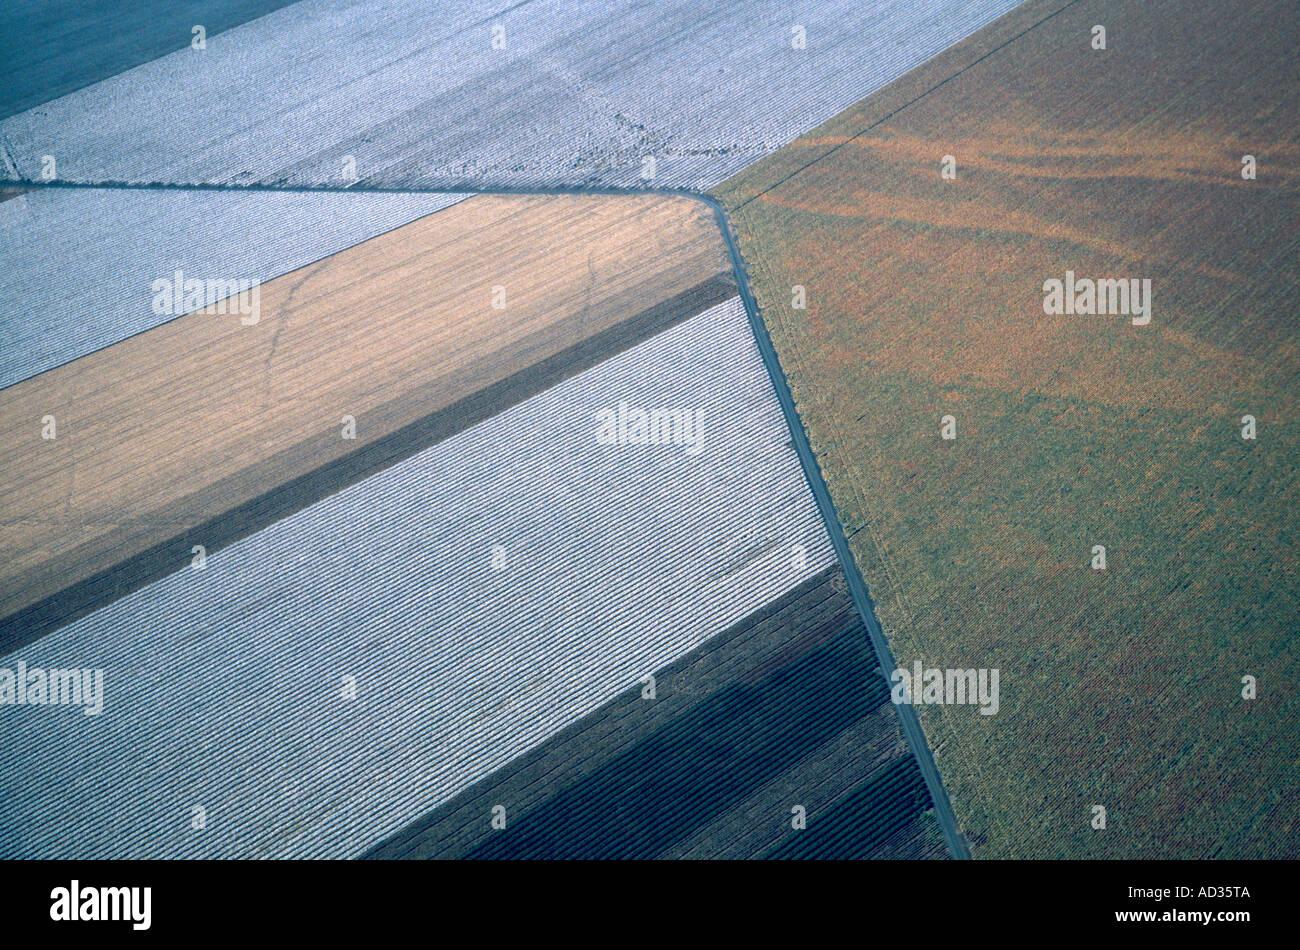 Farmland pattern - Stock Image